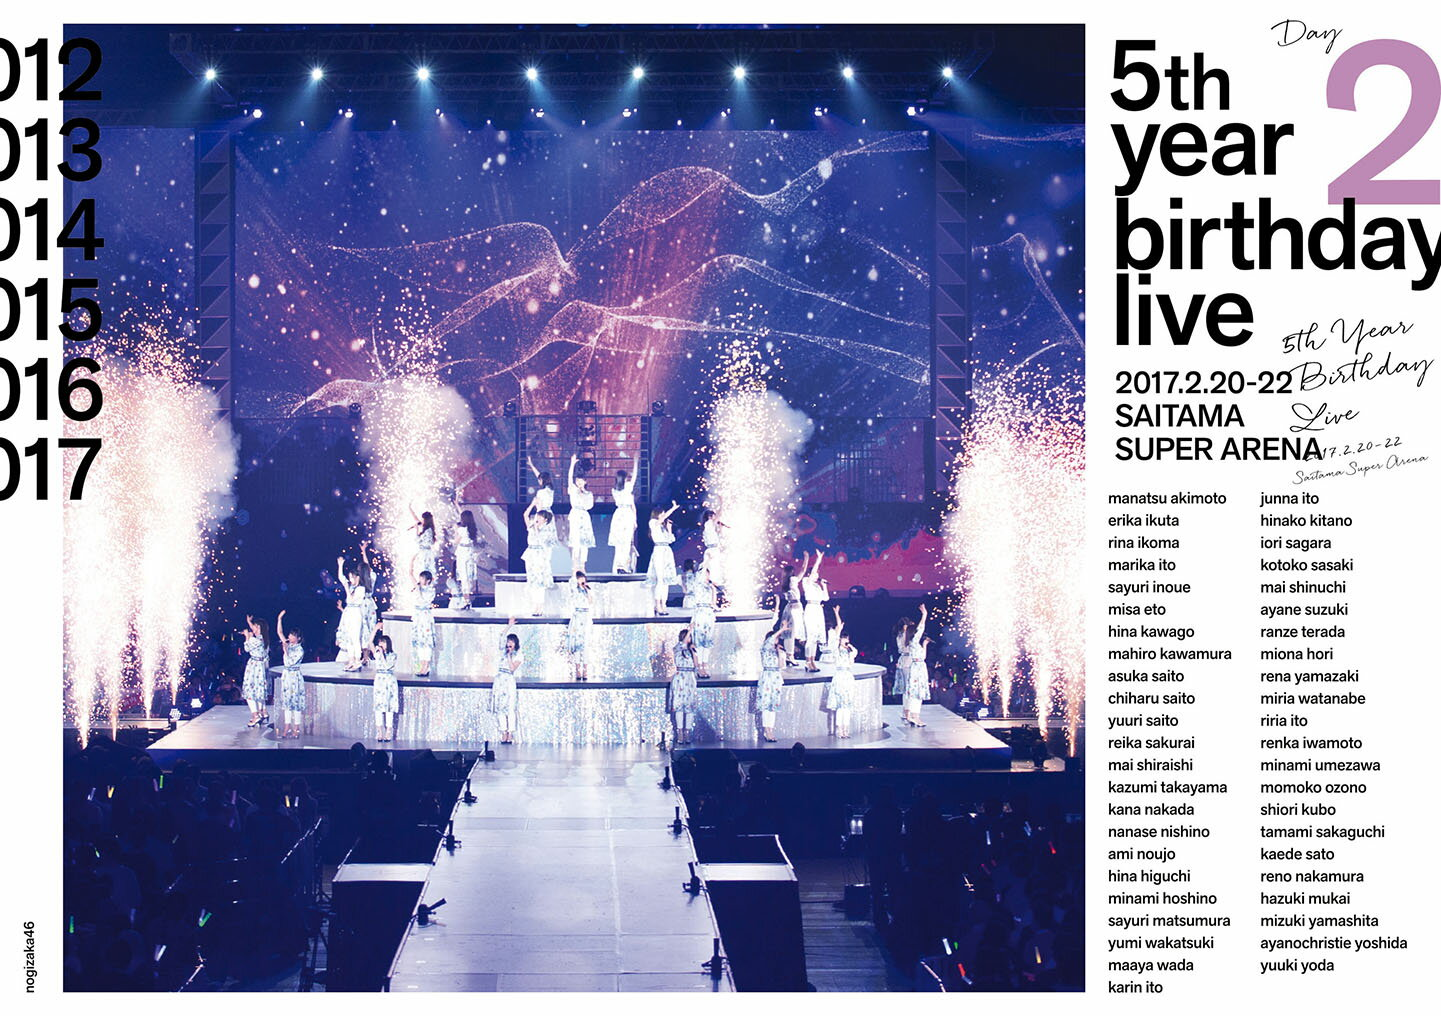 5th YEAR BIRTHDAY LIVE 2017.2.20-22 SAITAMA SUPER ARENA DAY2【Blu-ray】 [ 乃木坂46 ]